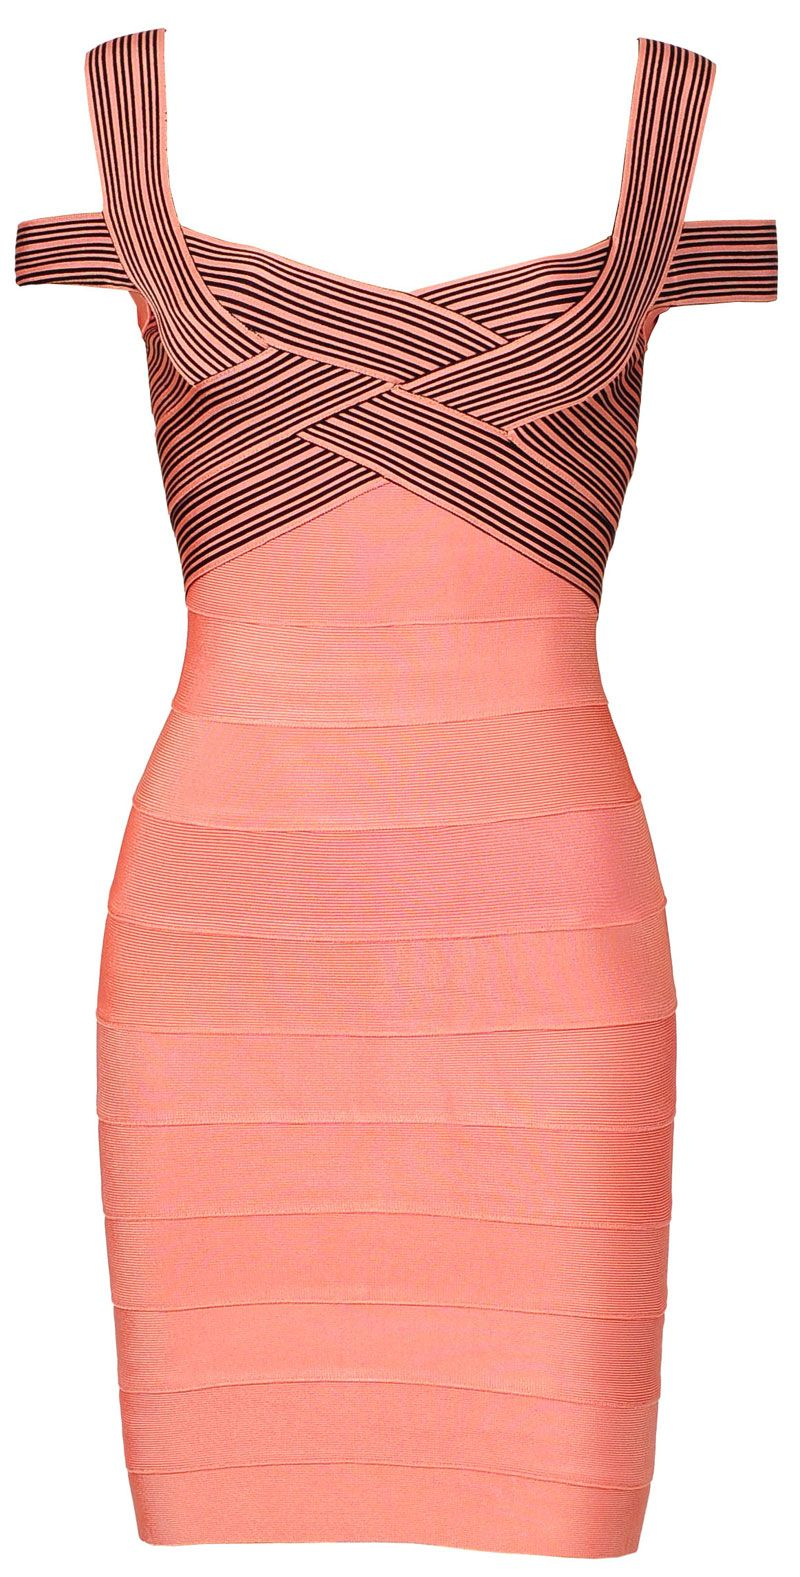 Natasha\' Rose Pink & Black Cross Bust Bandage Bodycon Dress ...